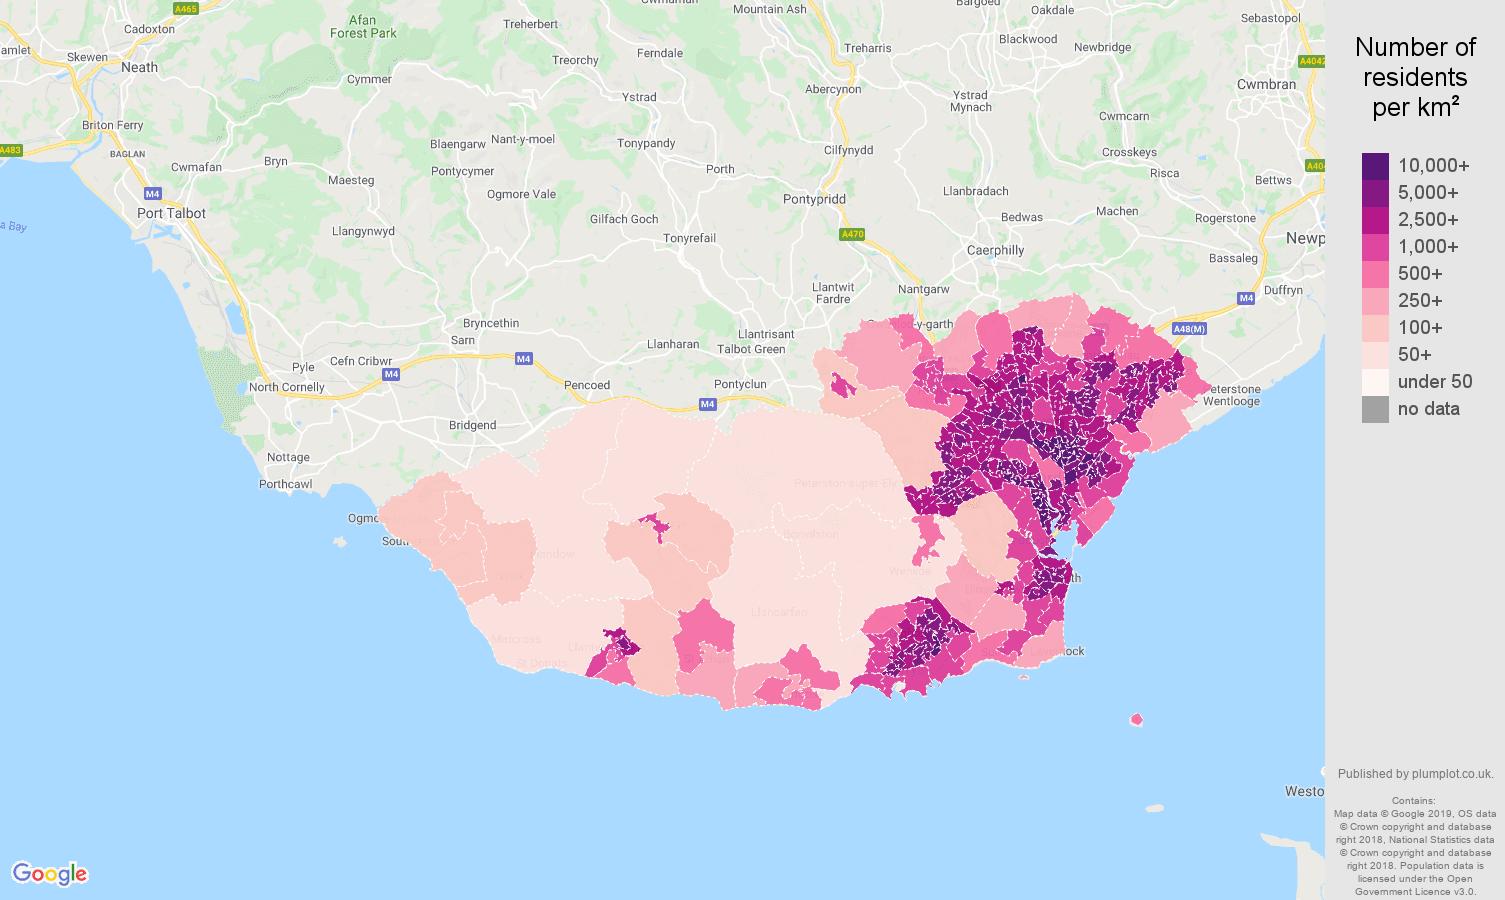 South Glamorgan population density map